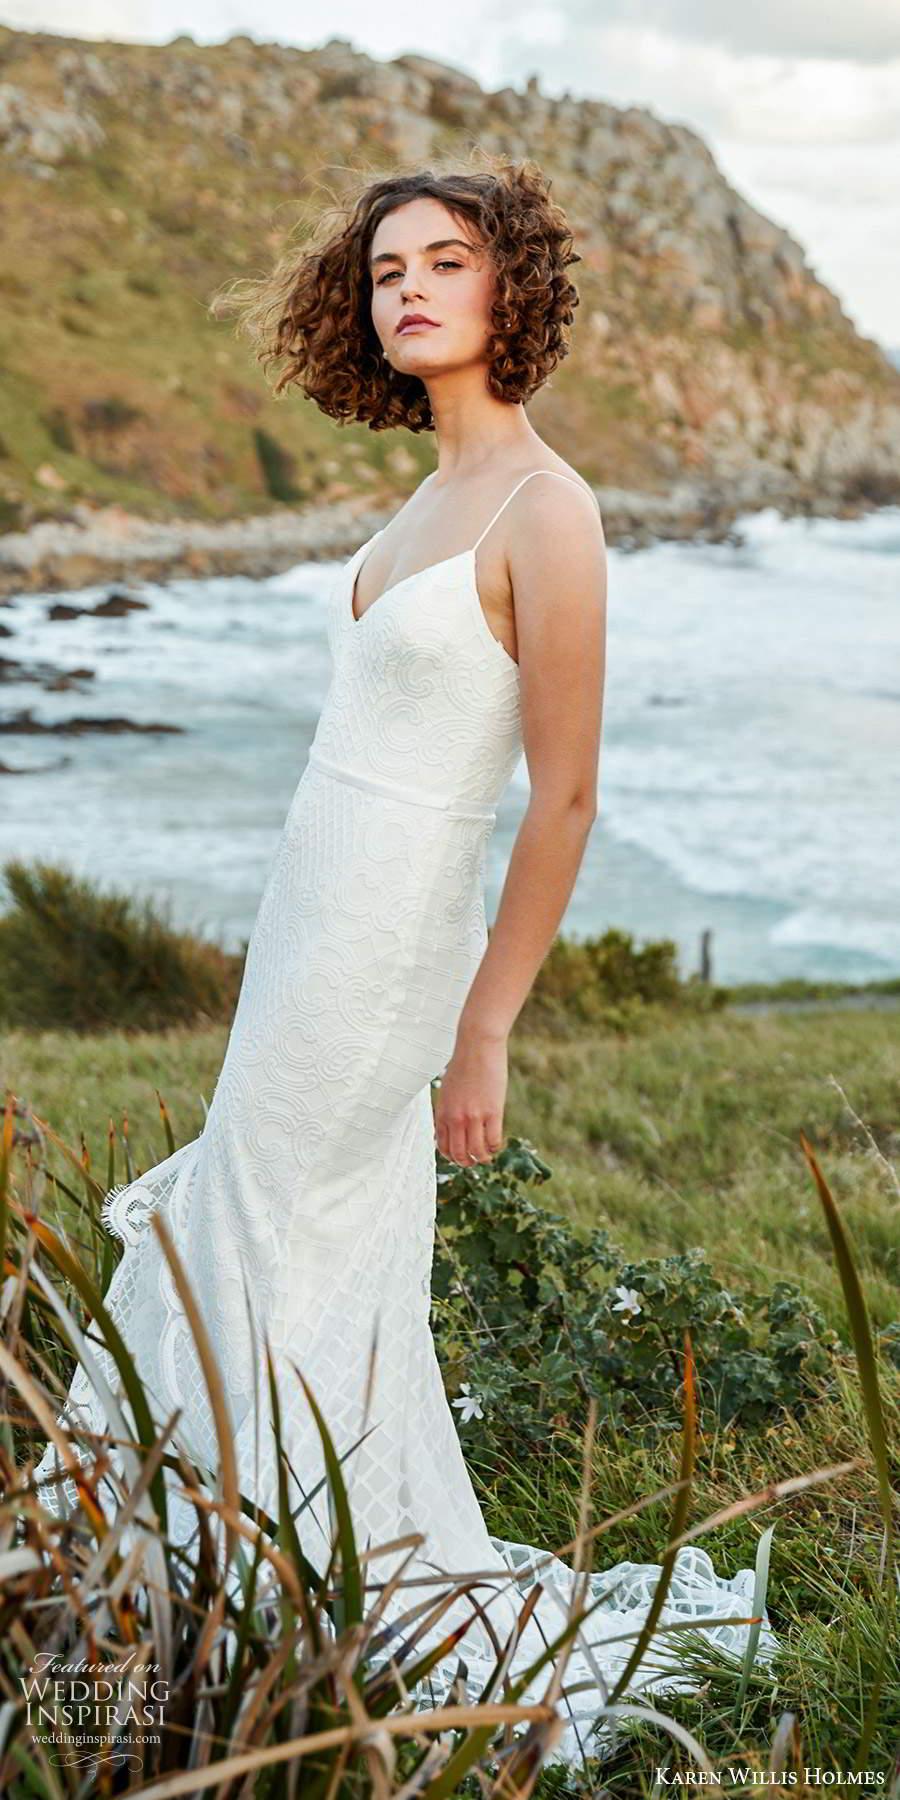 karen willis holmes 2020 bridal sleeveless thin straps v neckline embellished sheath wedding dress chapel train (6) sv